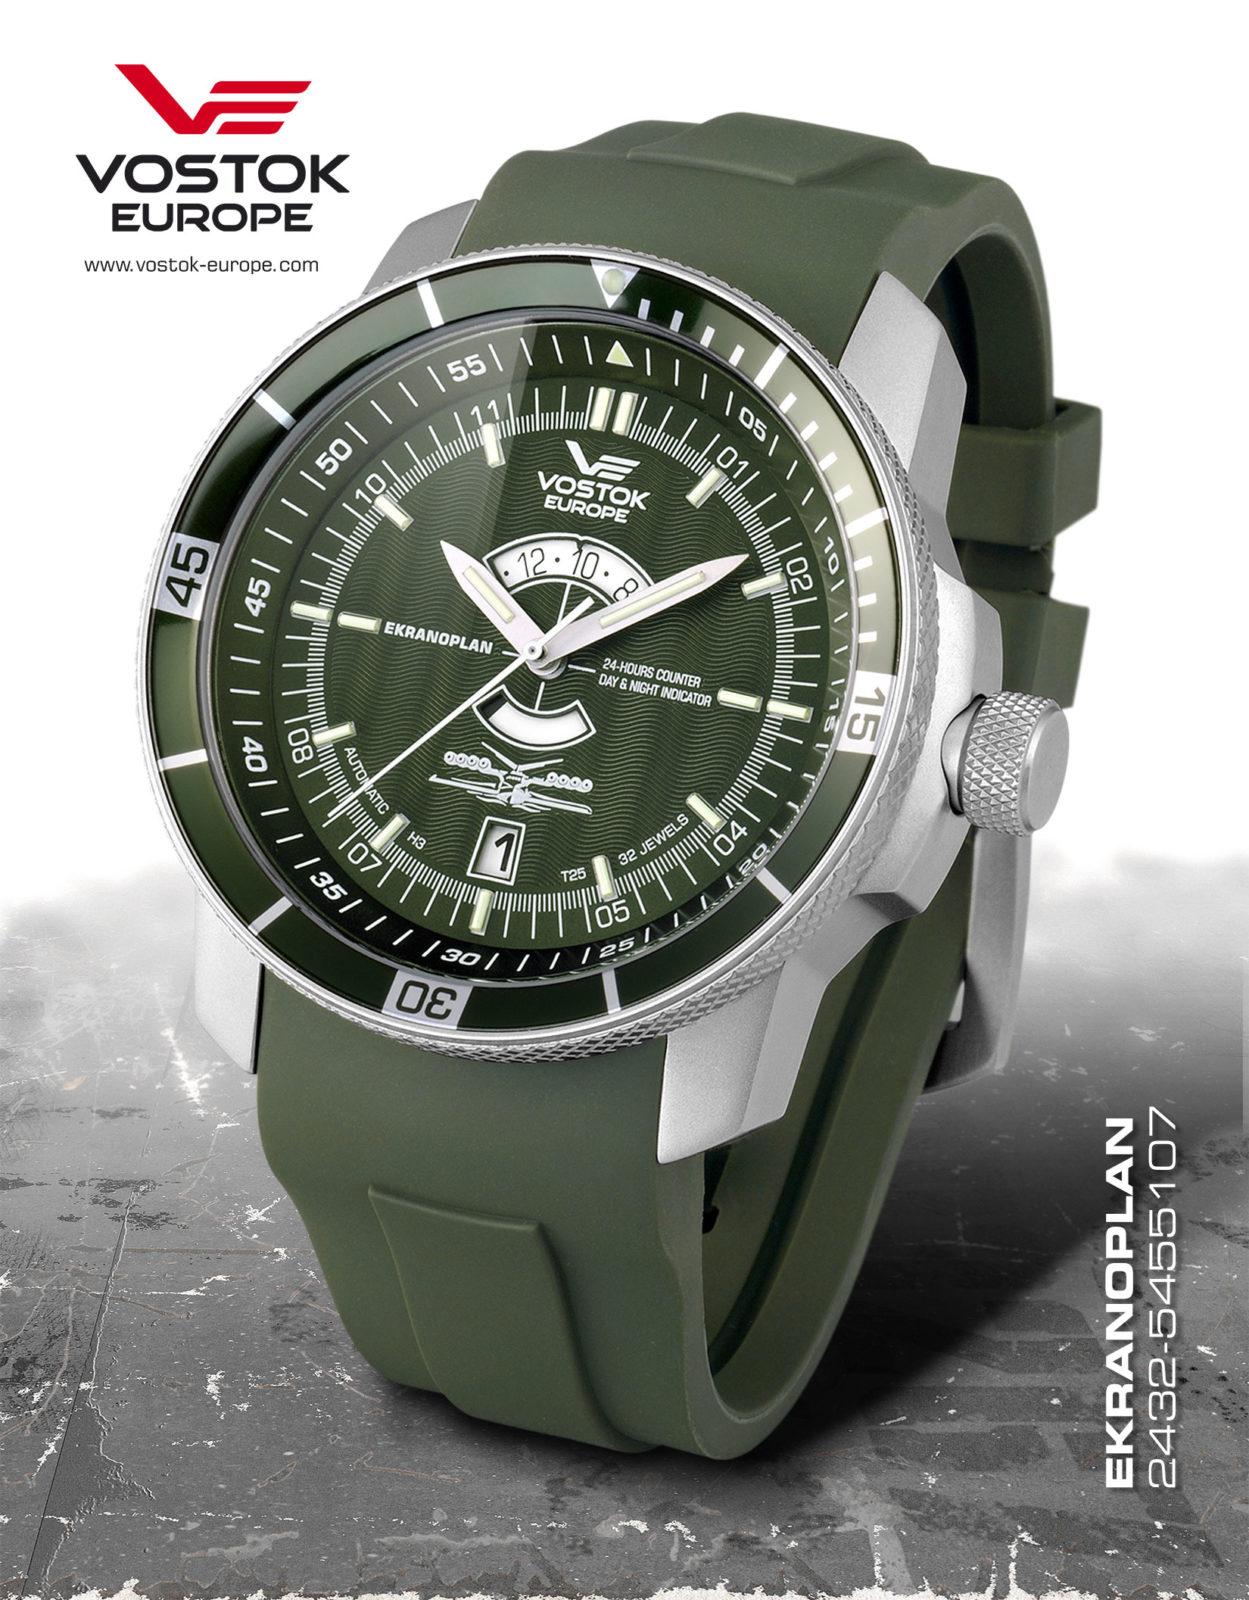 Vostok-Europe Automatic Watch Ekranoplan Caspian Sea Monster 2432.01 / 5455107